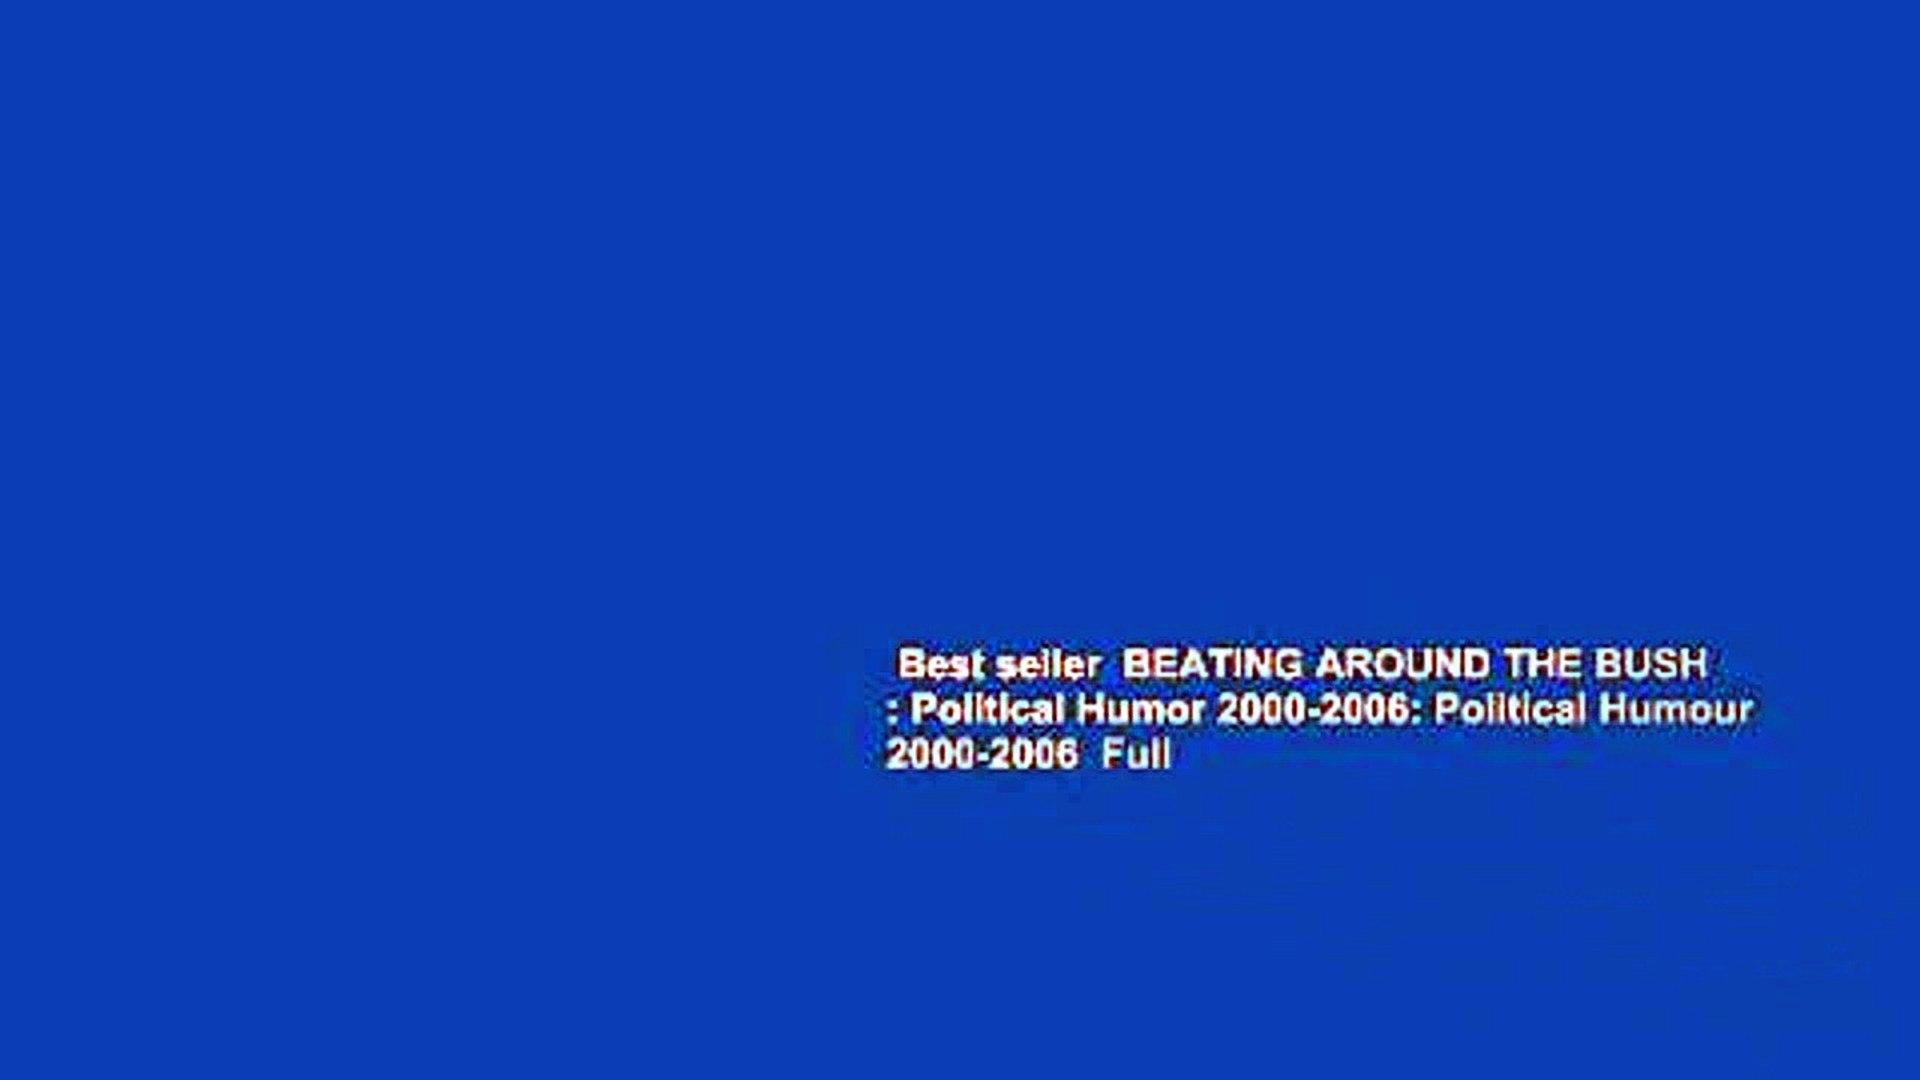 Best seller  BEATING AROUND THE BUSH : Political Humor 2000-2006: Political Humour 2000-2006  Full